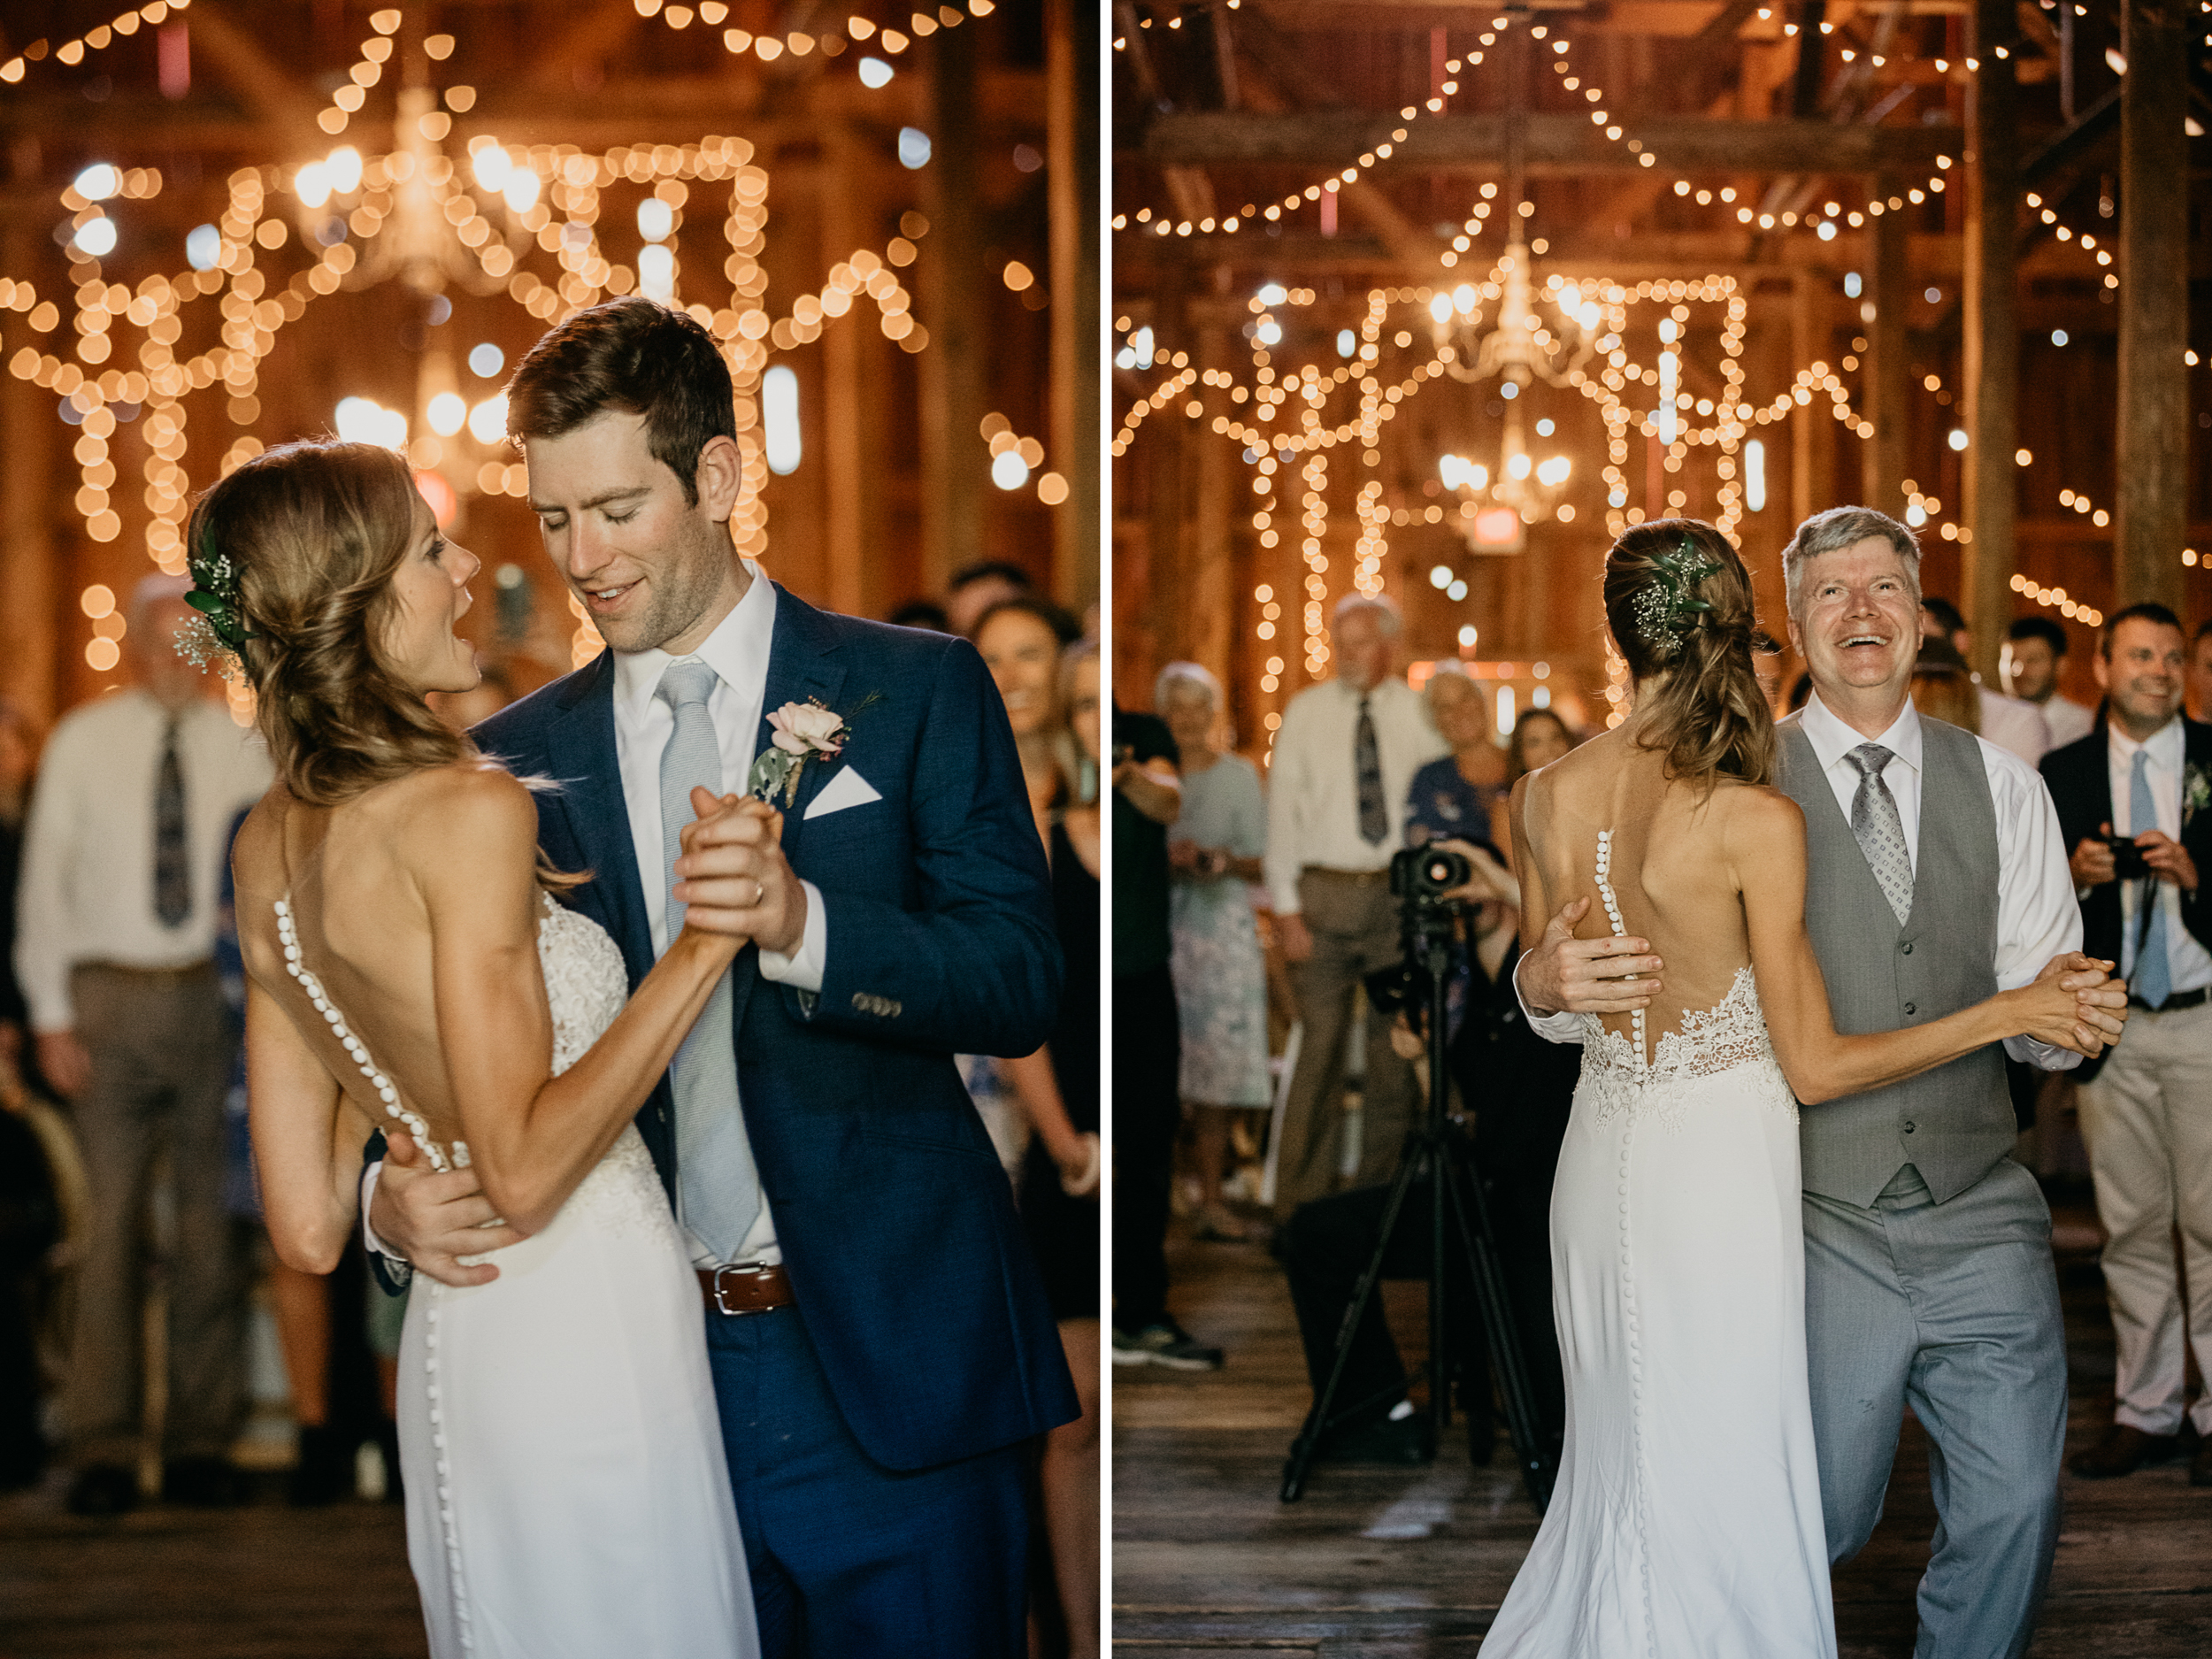 Karen_Alex_Bliss_ridge_farm_Vermont_wedding029.jpg